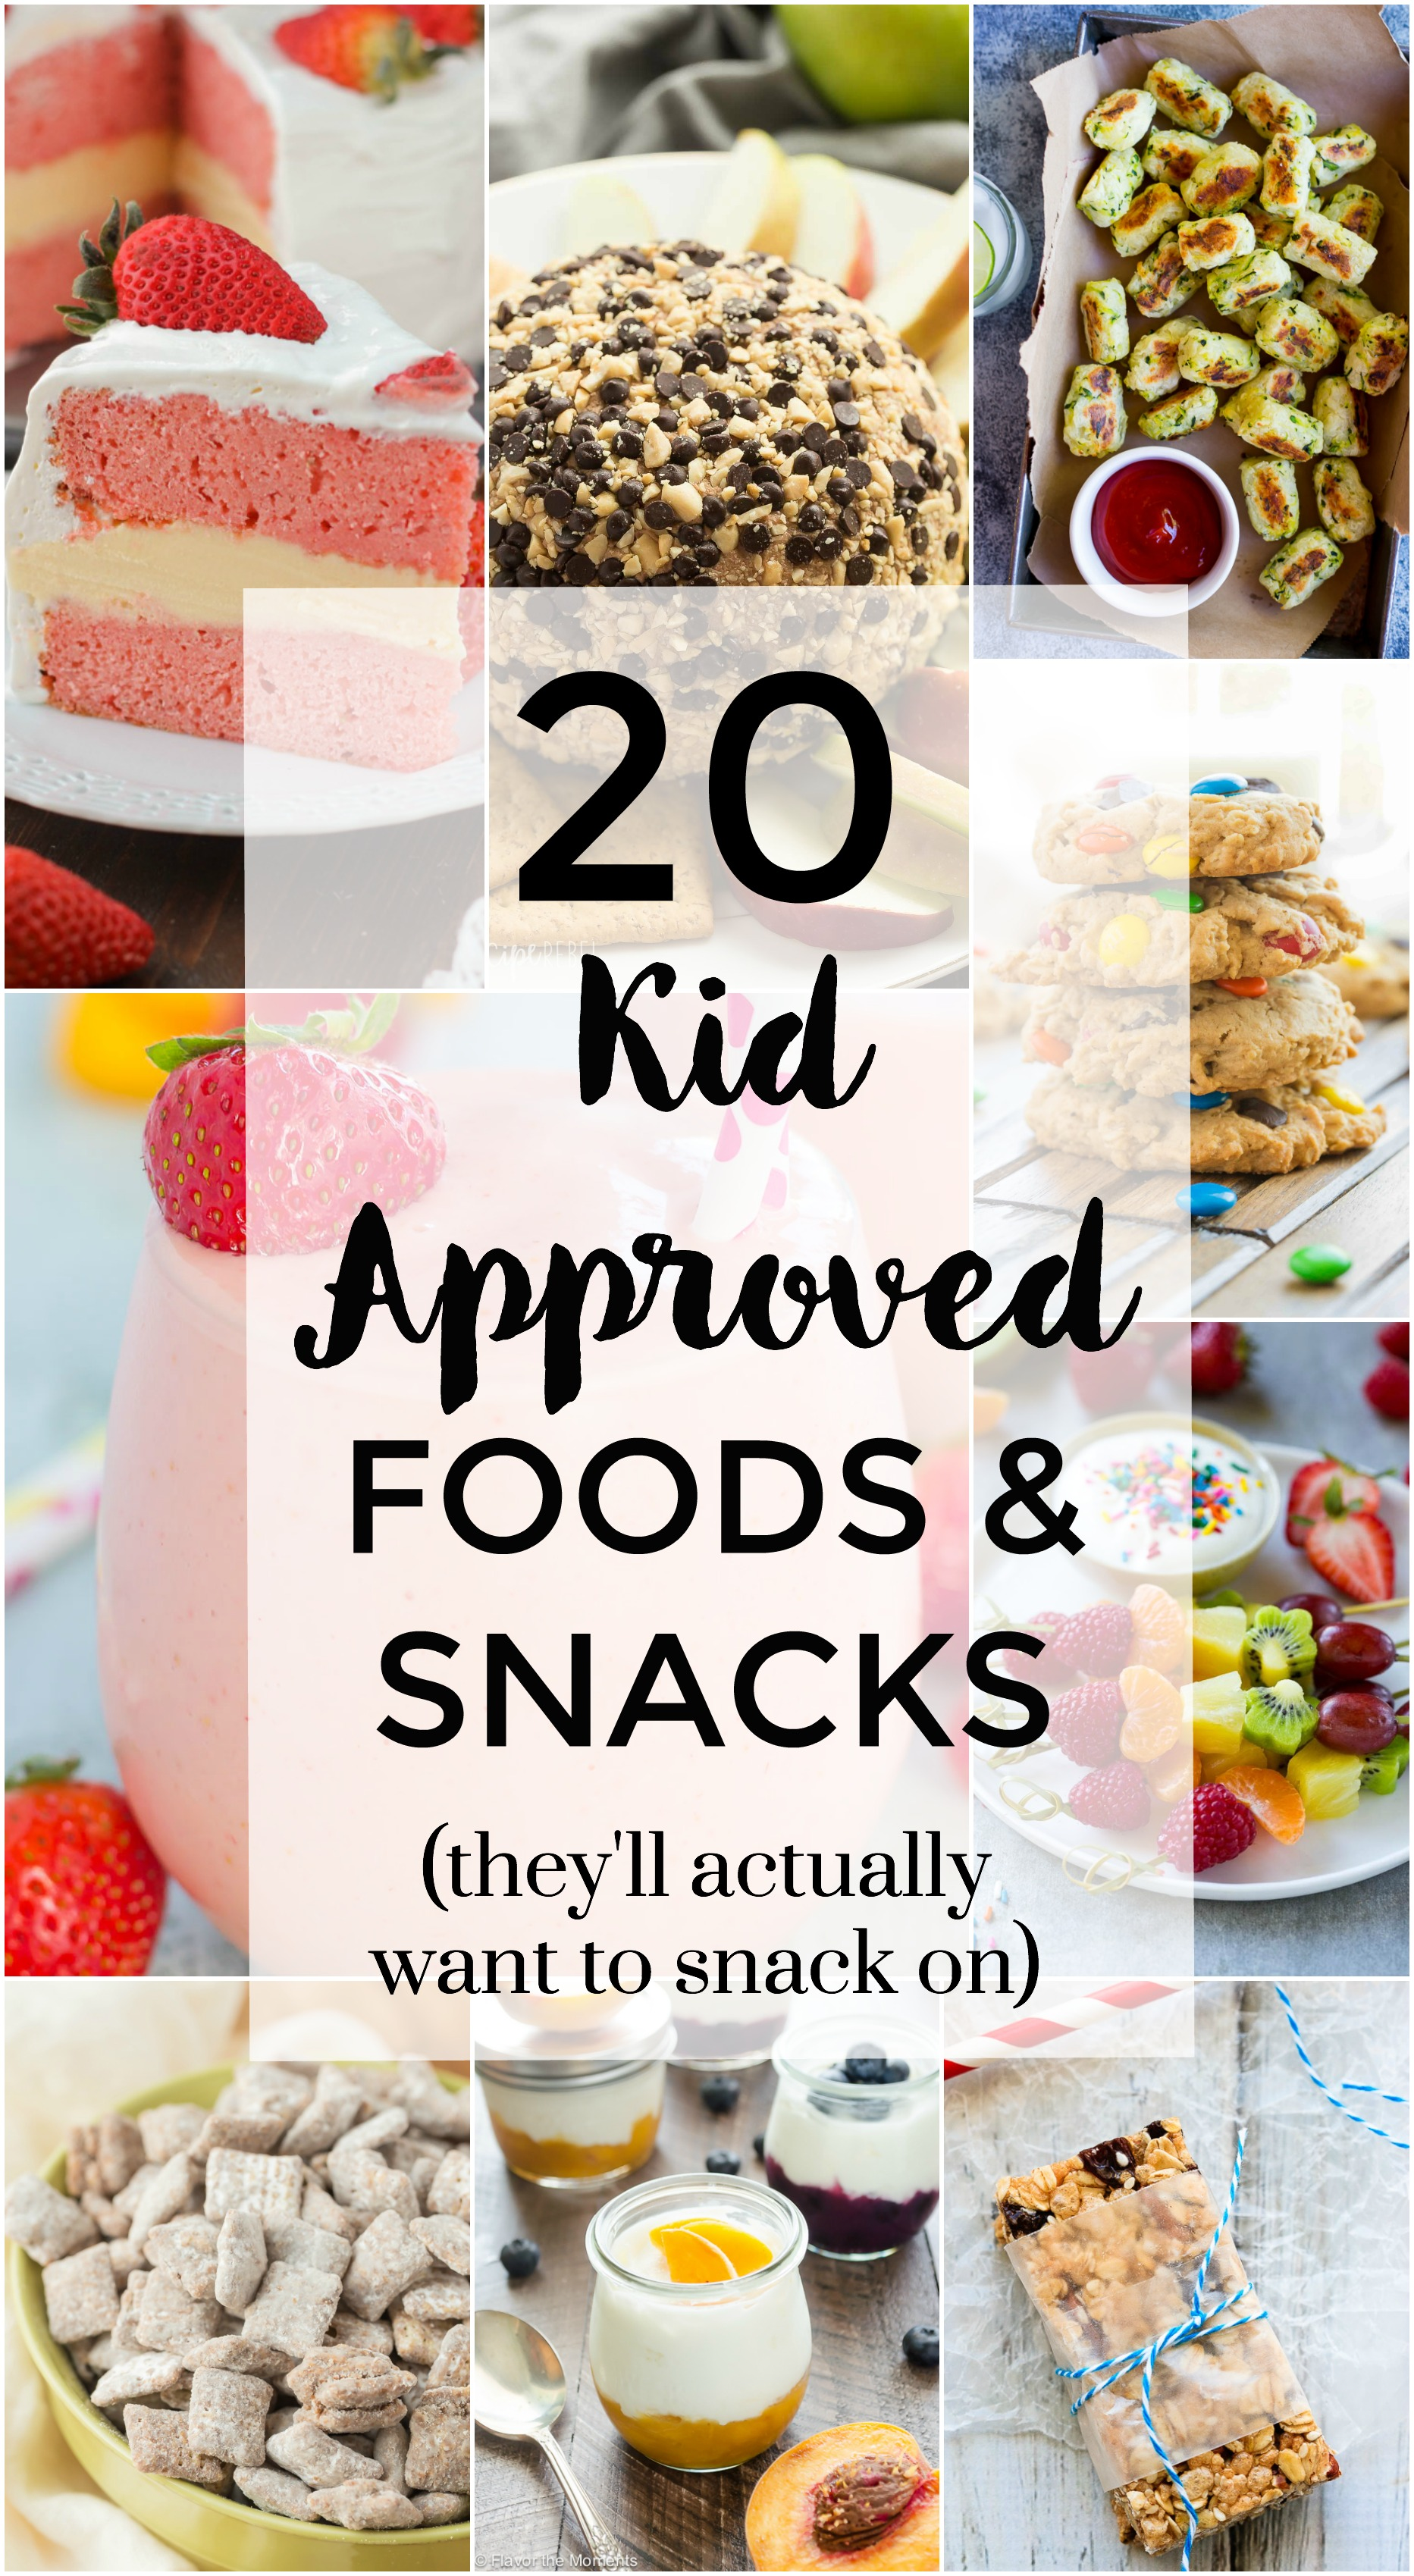 20 Kid Approved Foods & Snacks